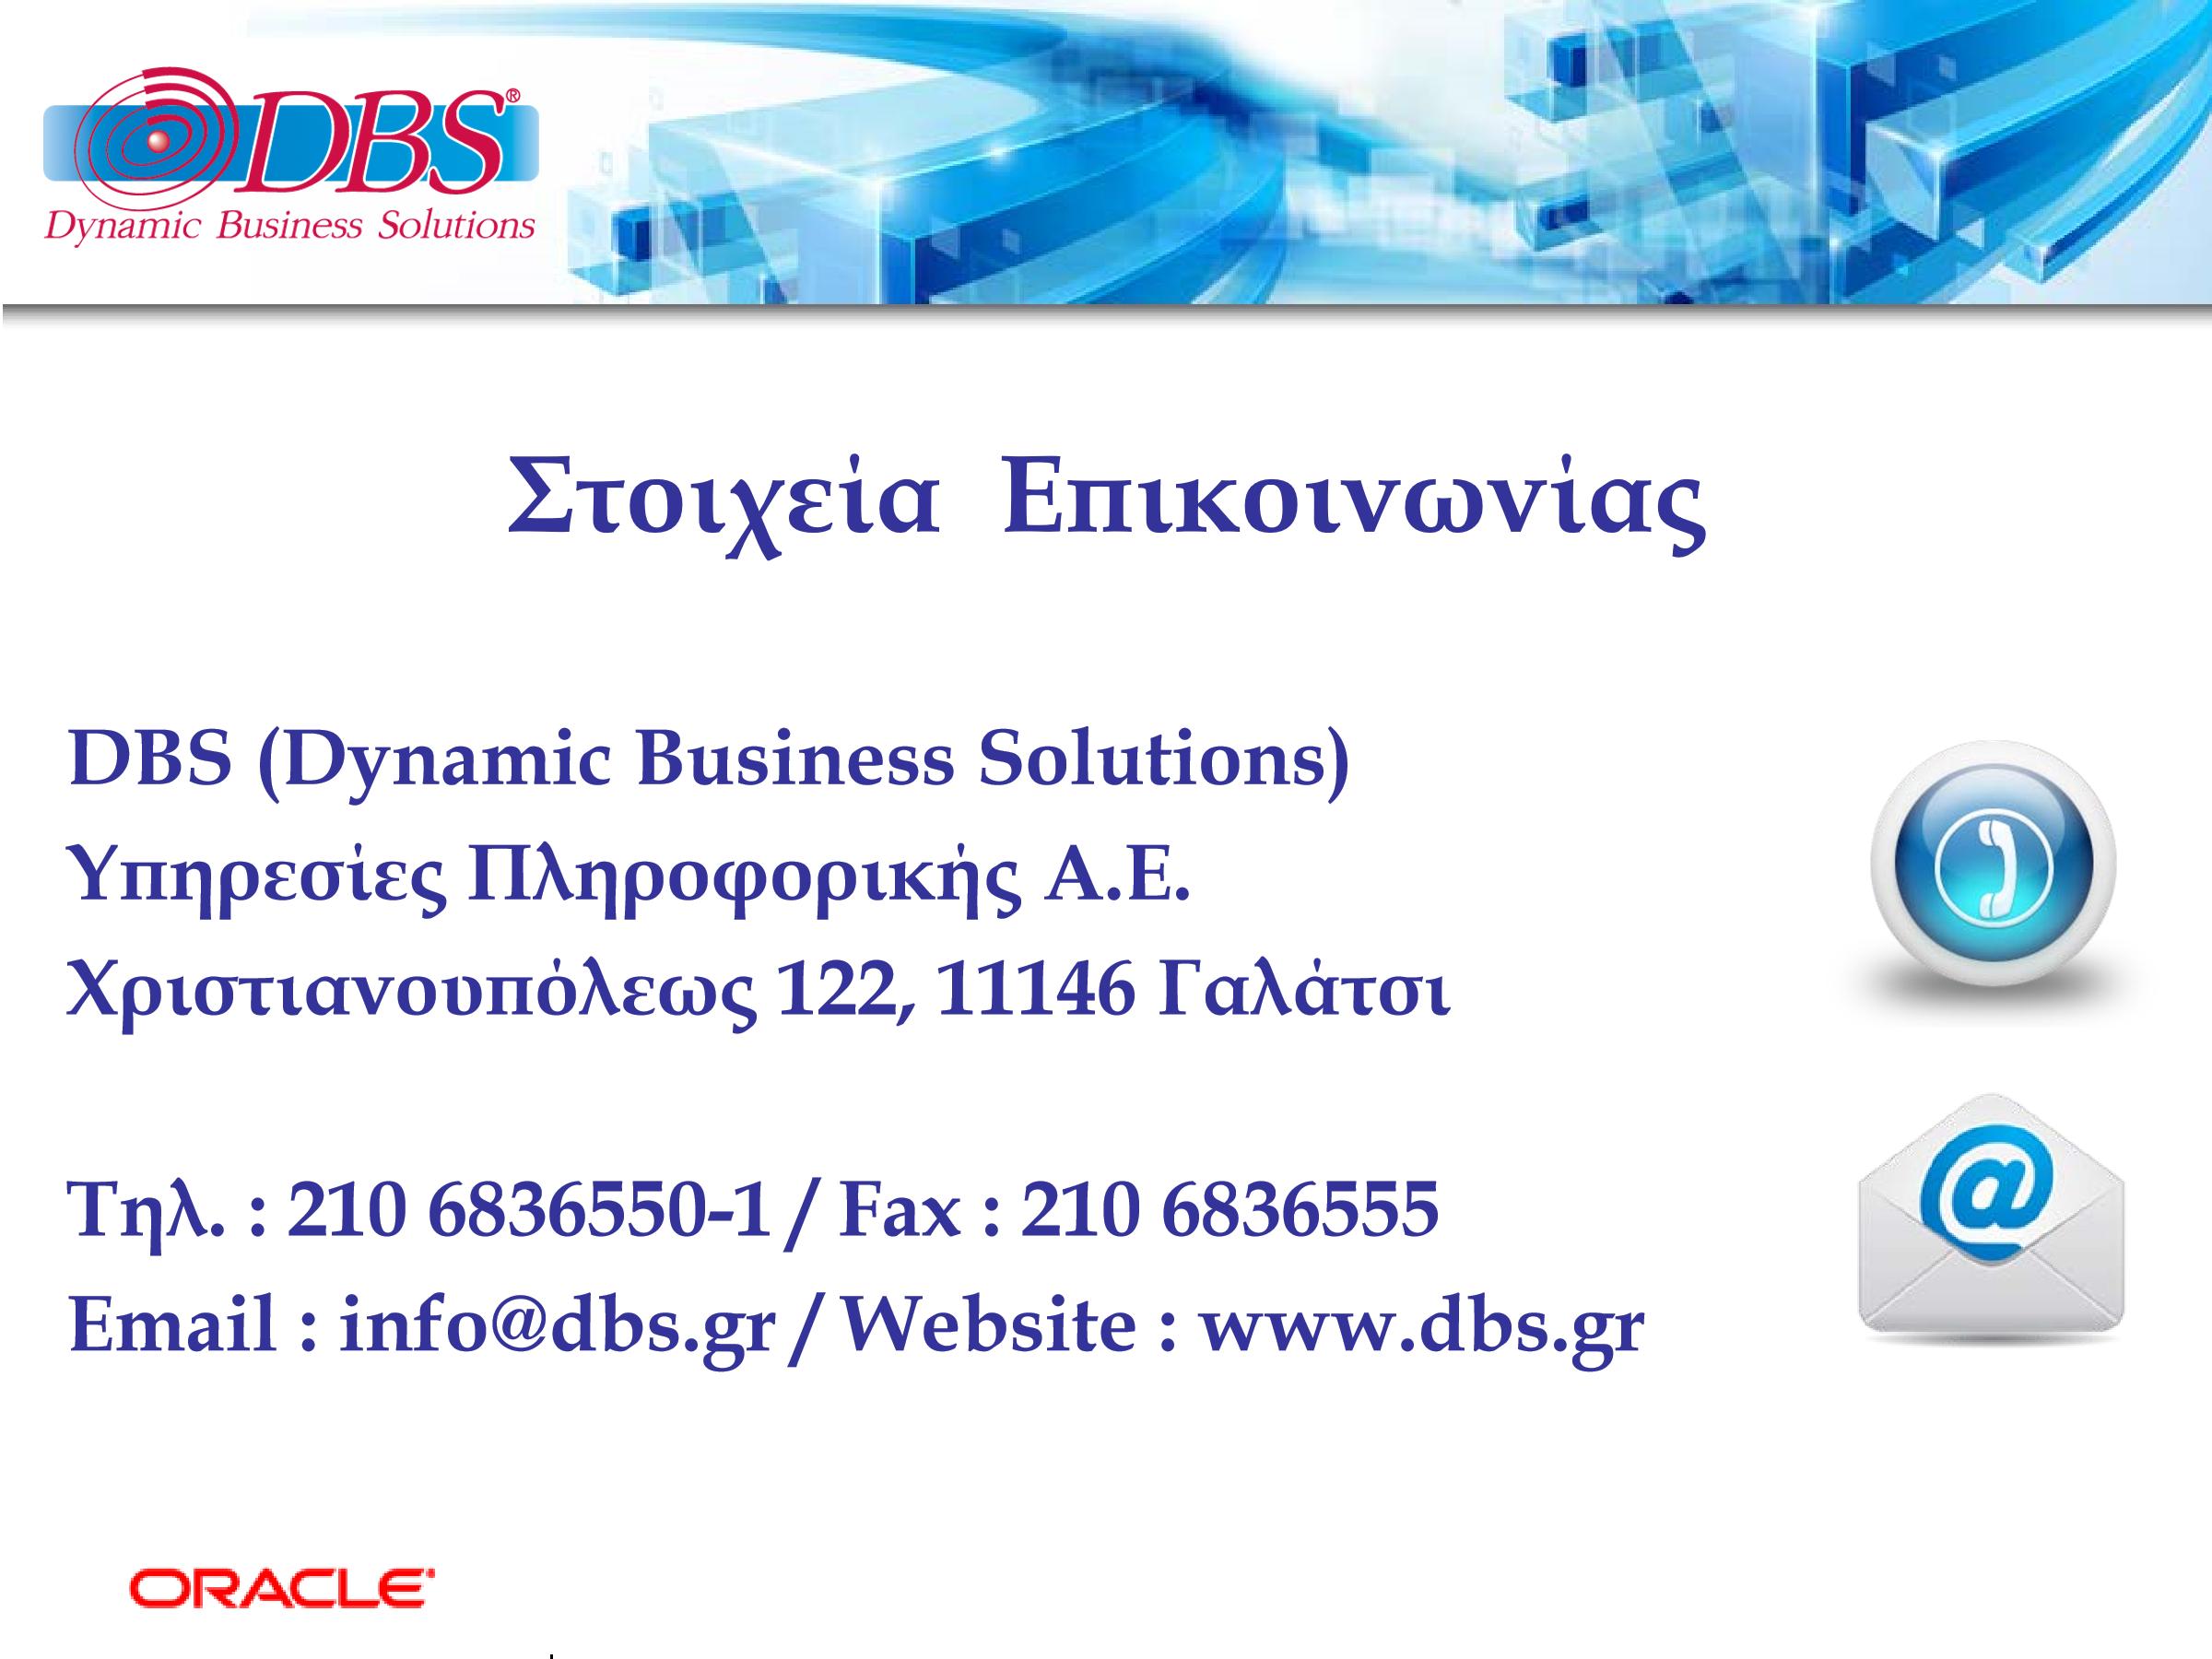 DBSDEMO2019_COMPANY_PROFILE_V18_R26FB-EL-23